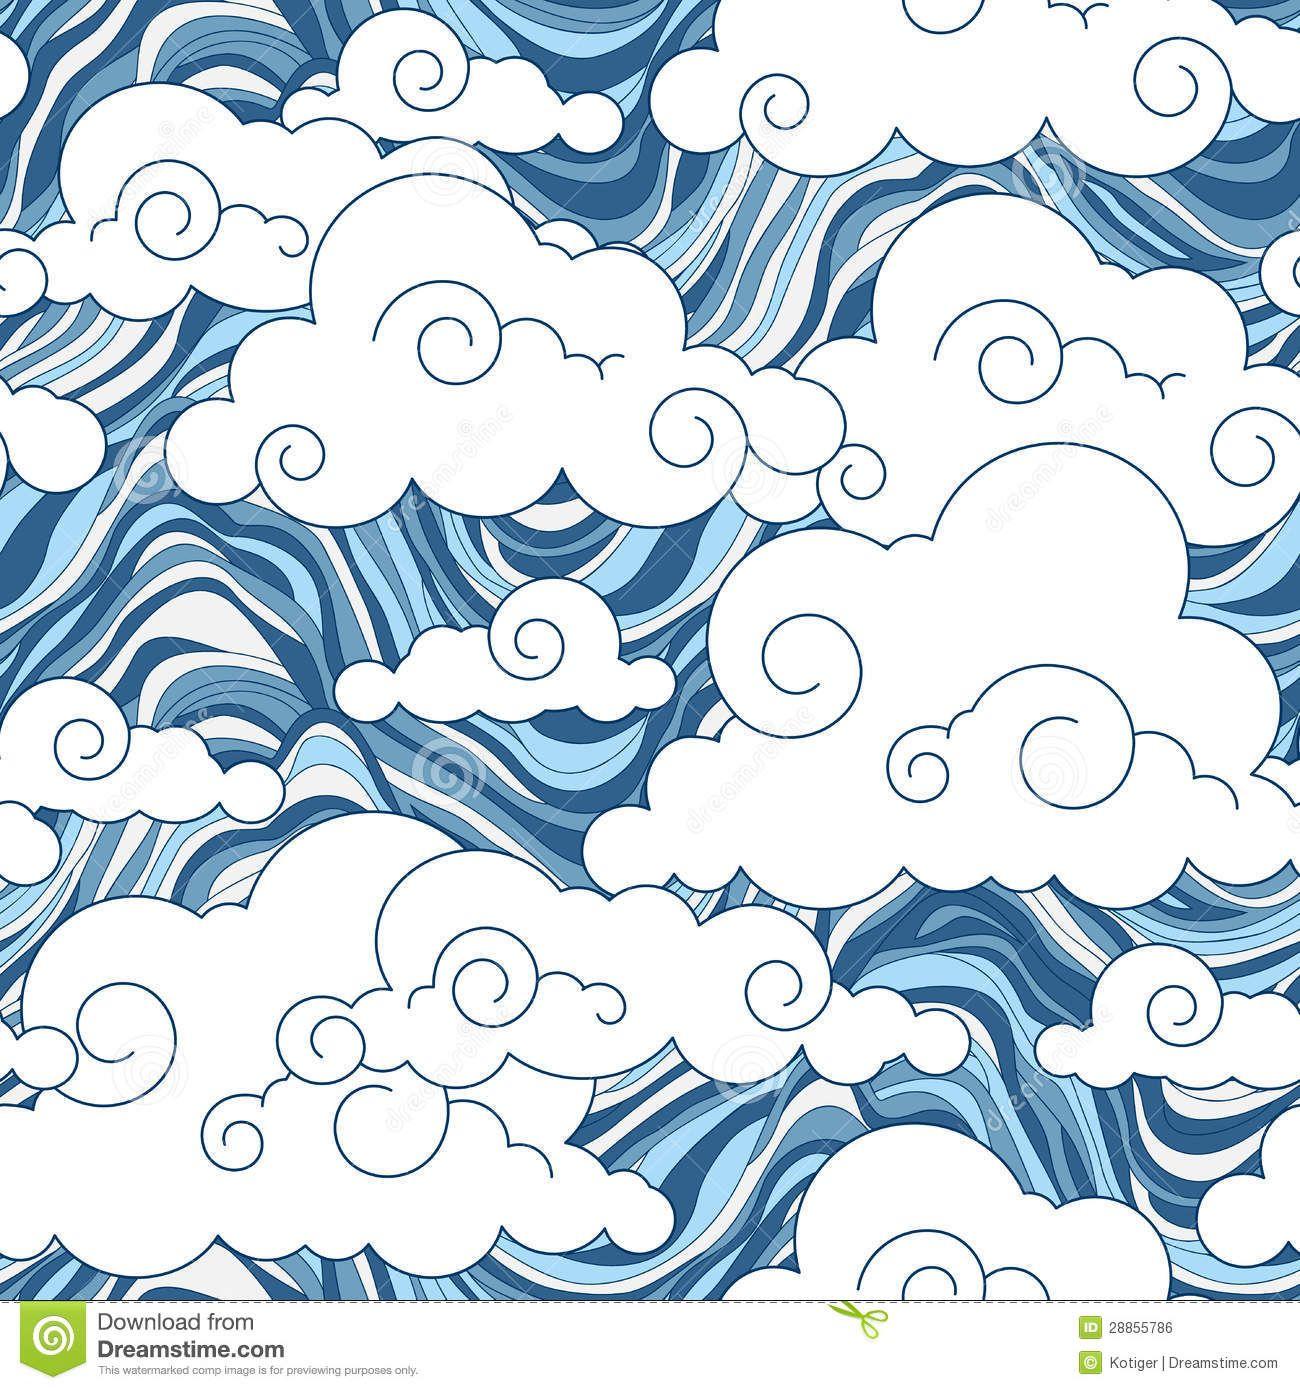 Japanese Cloud Drawing   www.pixshark.com - Images ...